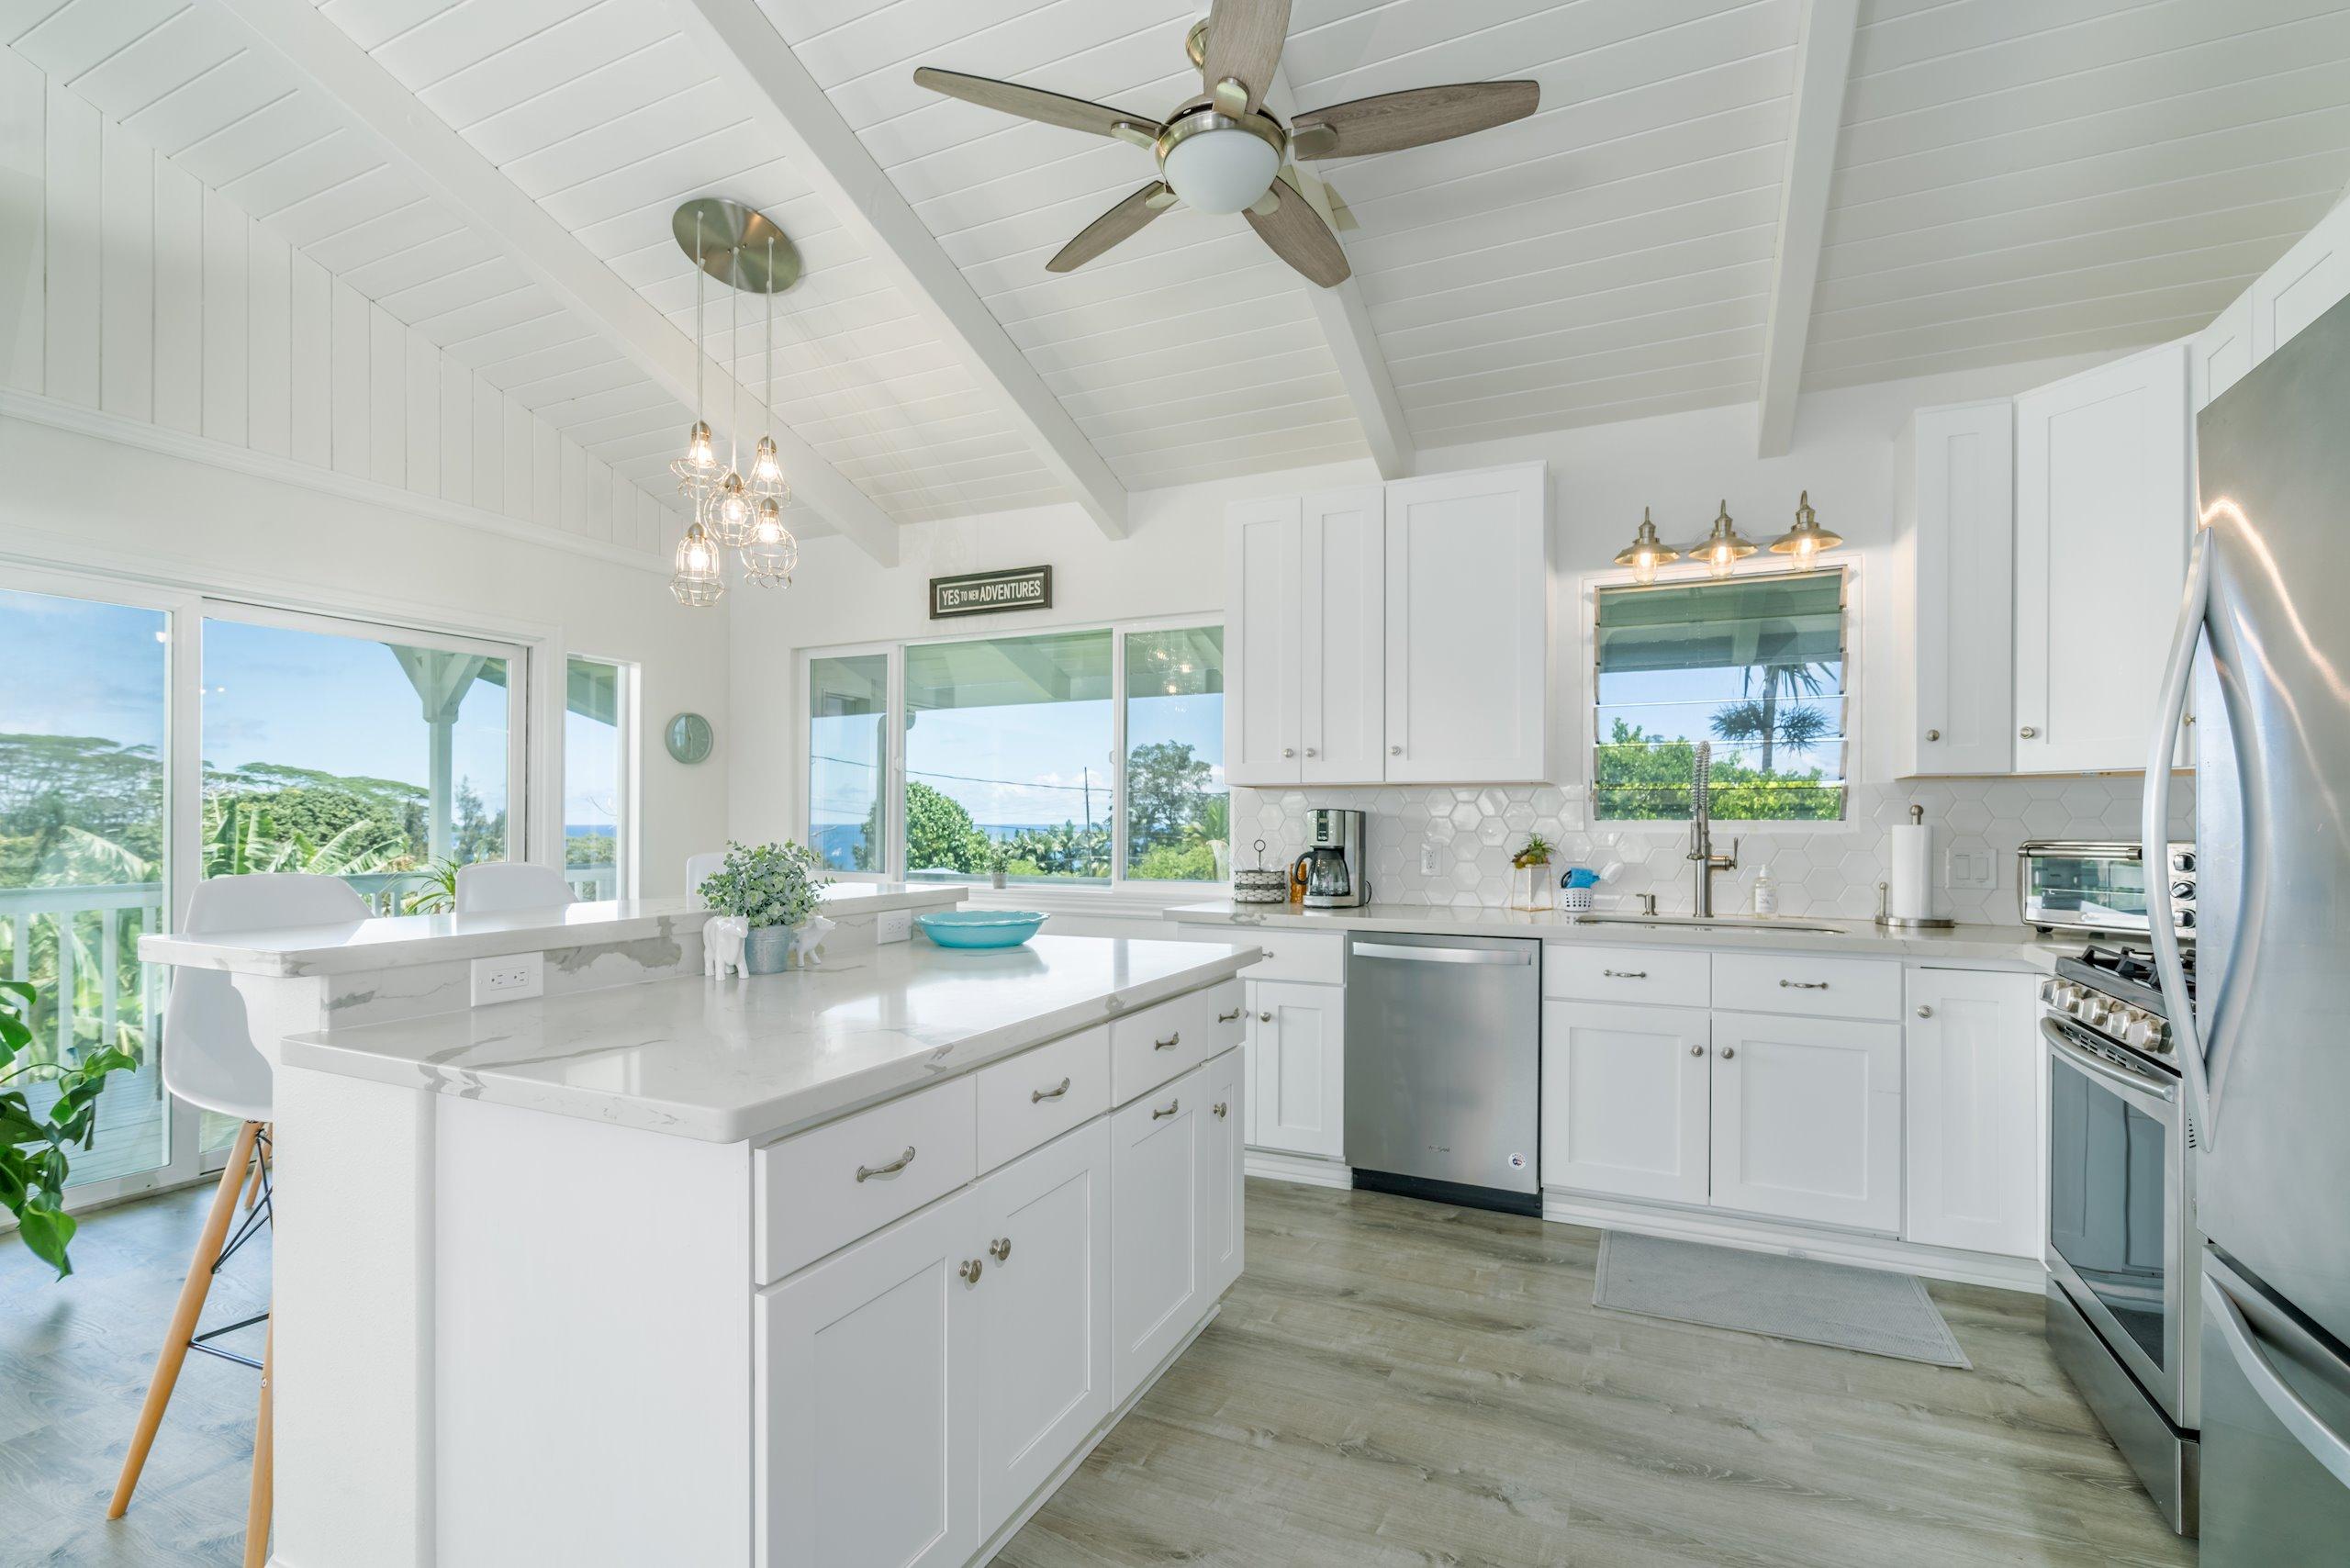 Brand new custom white cabinets, modern off white honeycomb backsplash, off white grey vein quartz countertops, double wide kitchen sink, brand new top of the line appliances.